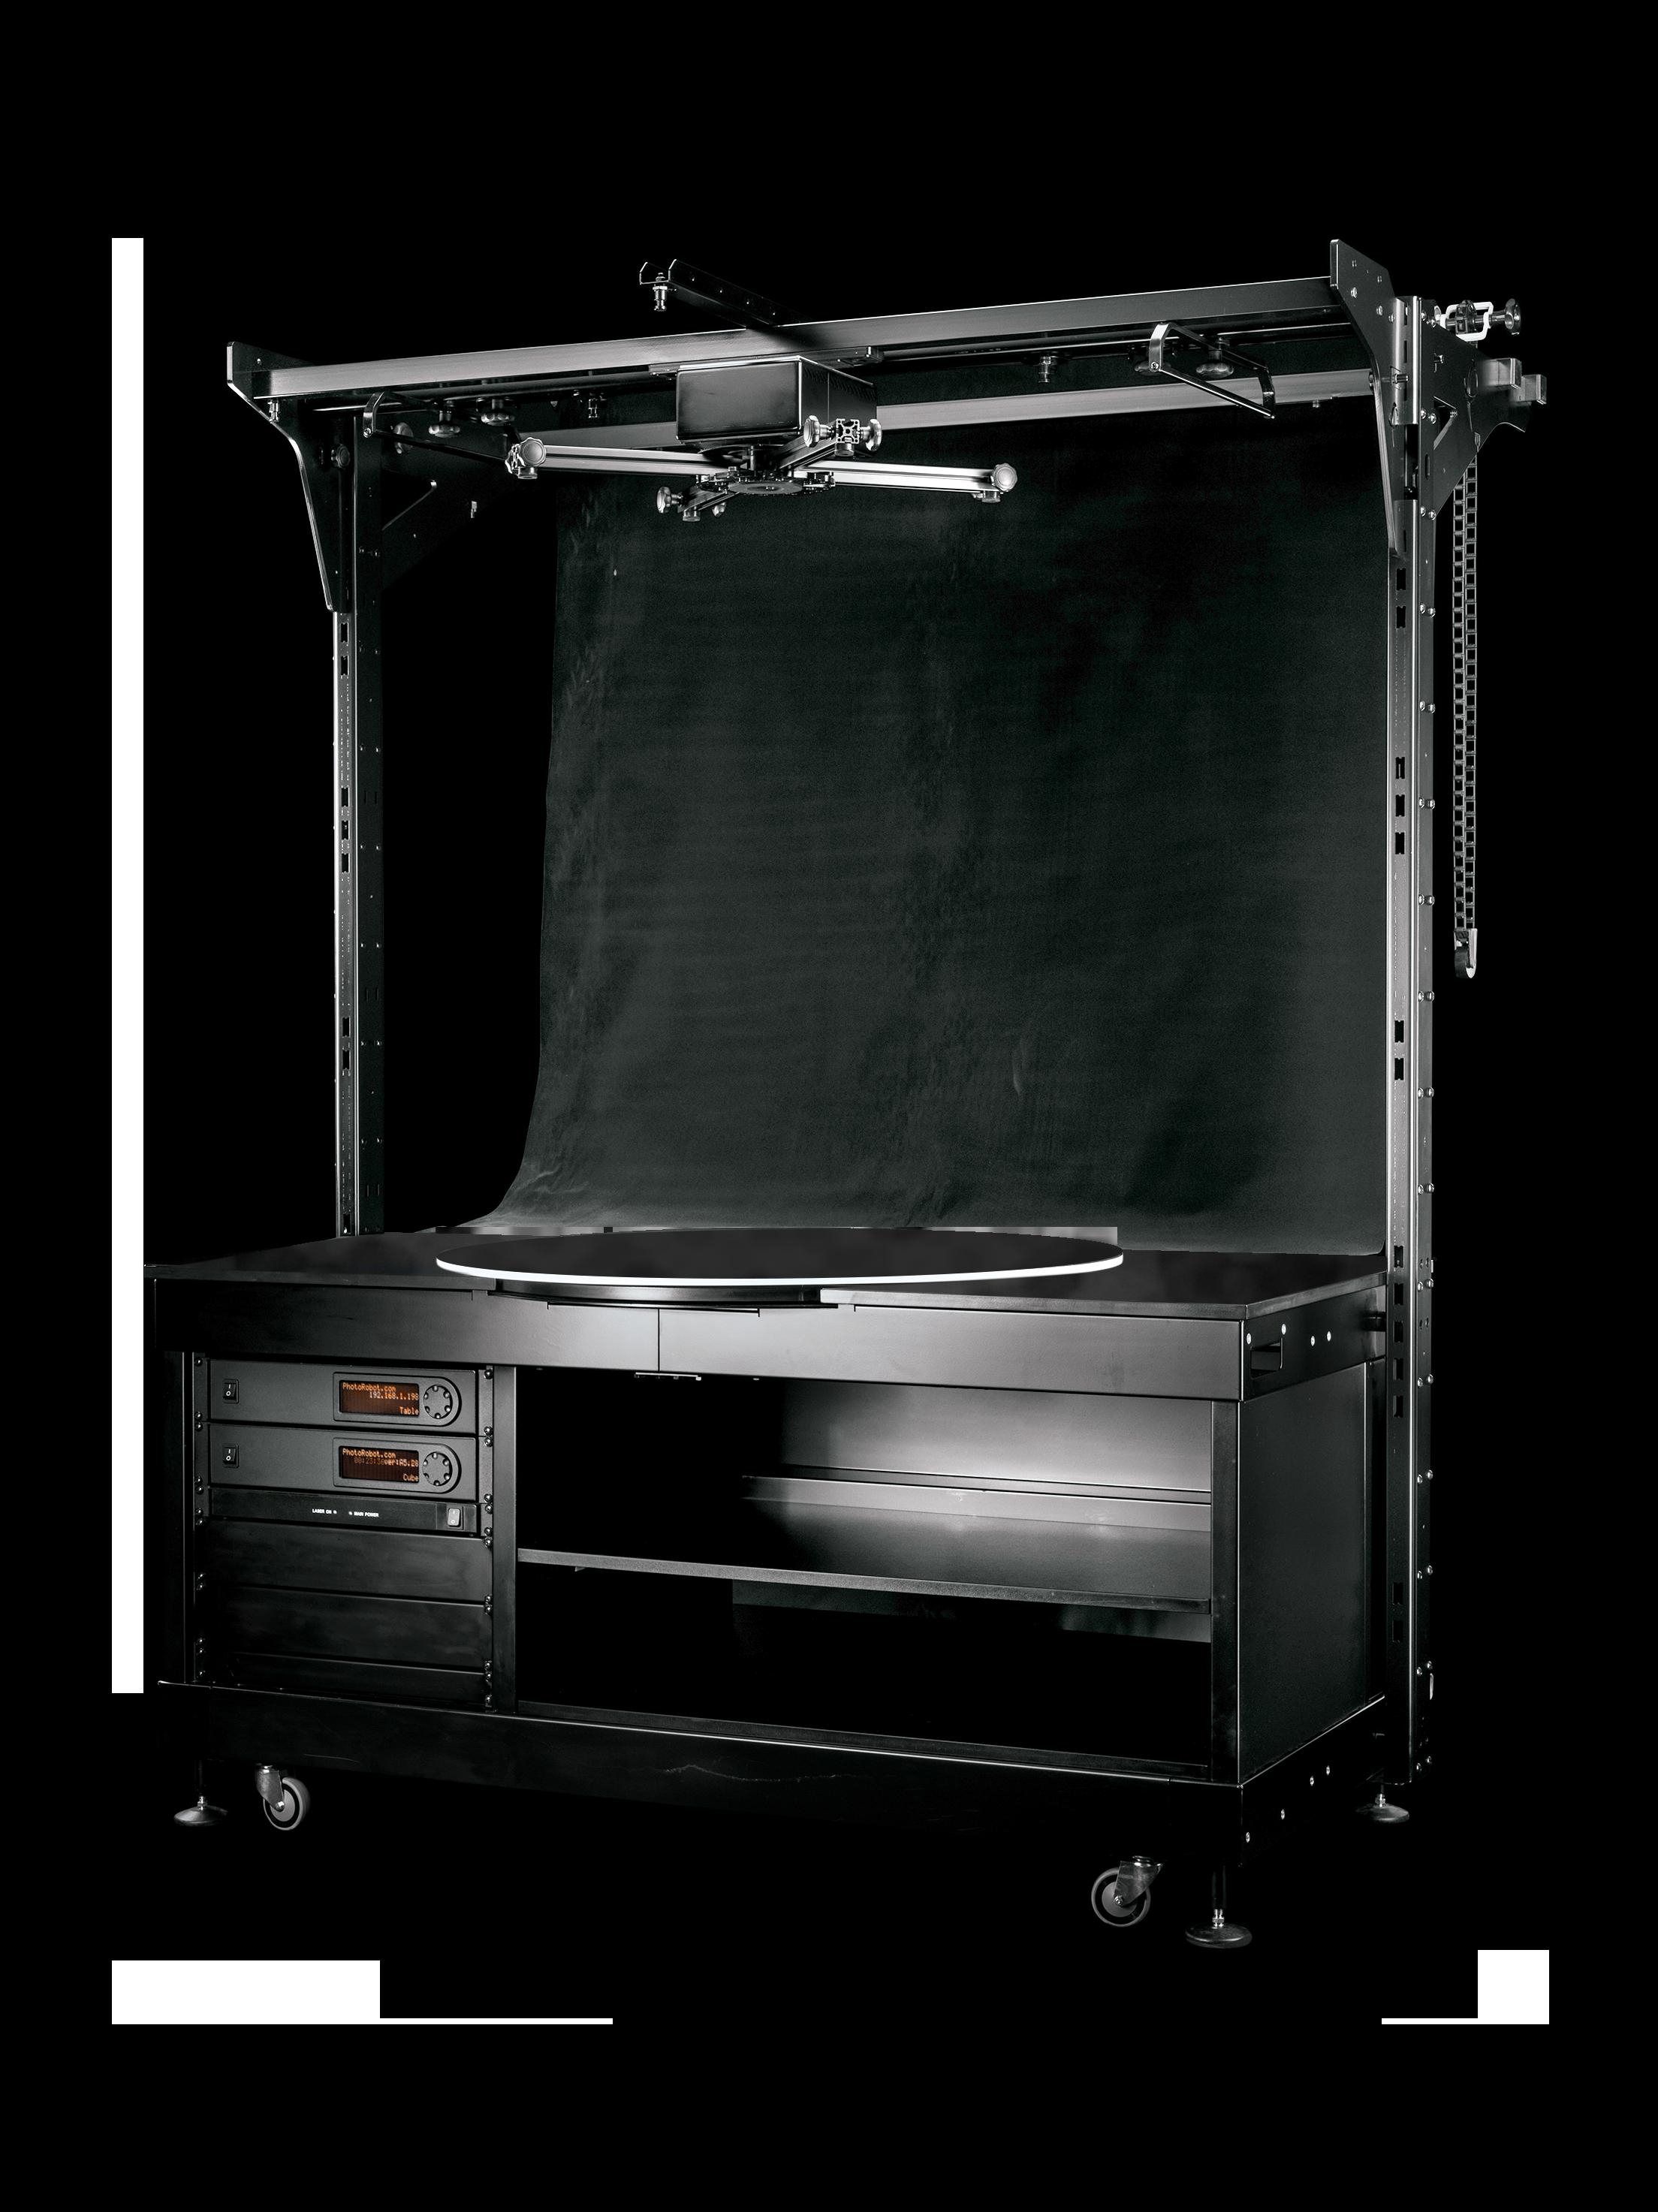 PhotoRobot turntable instaliran u kombinaciji sa PhotoRobot CUBE za fotografisanje složenih predmeta